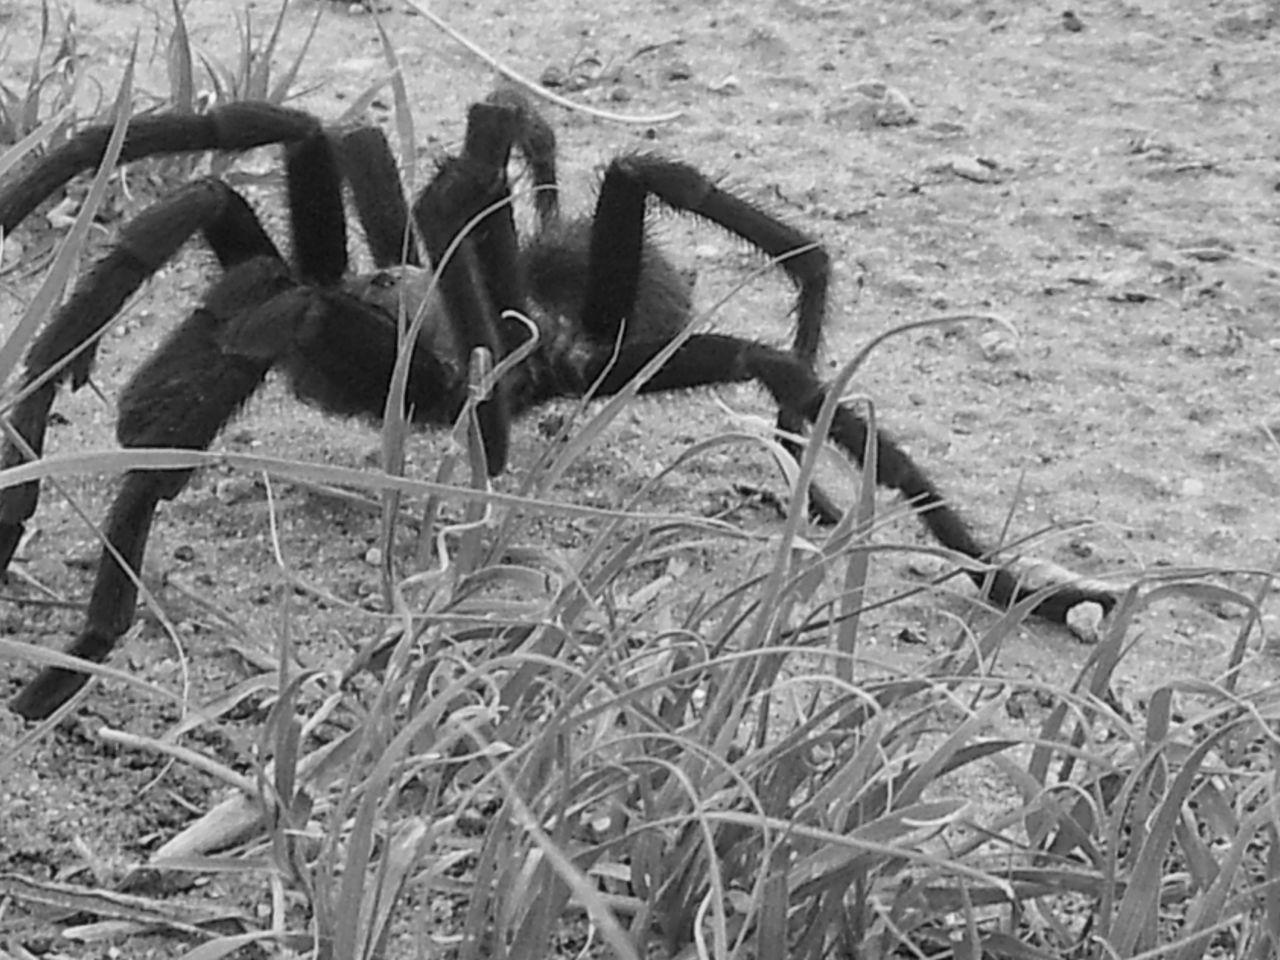 Coming thru, excuse me, spider, tarantula